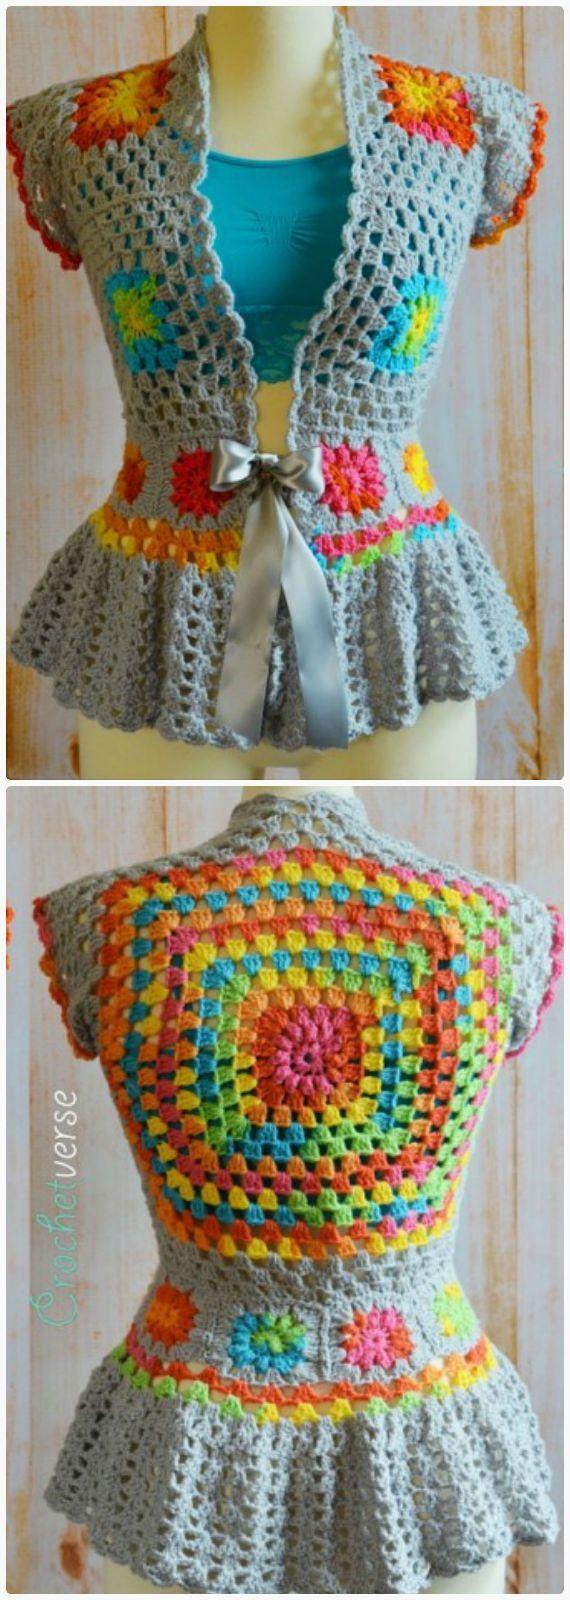 Crochet Garden Party Jacket Free Pattern - Crochet Women Capes & Poncho Free Patterns